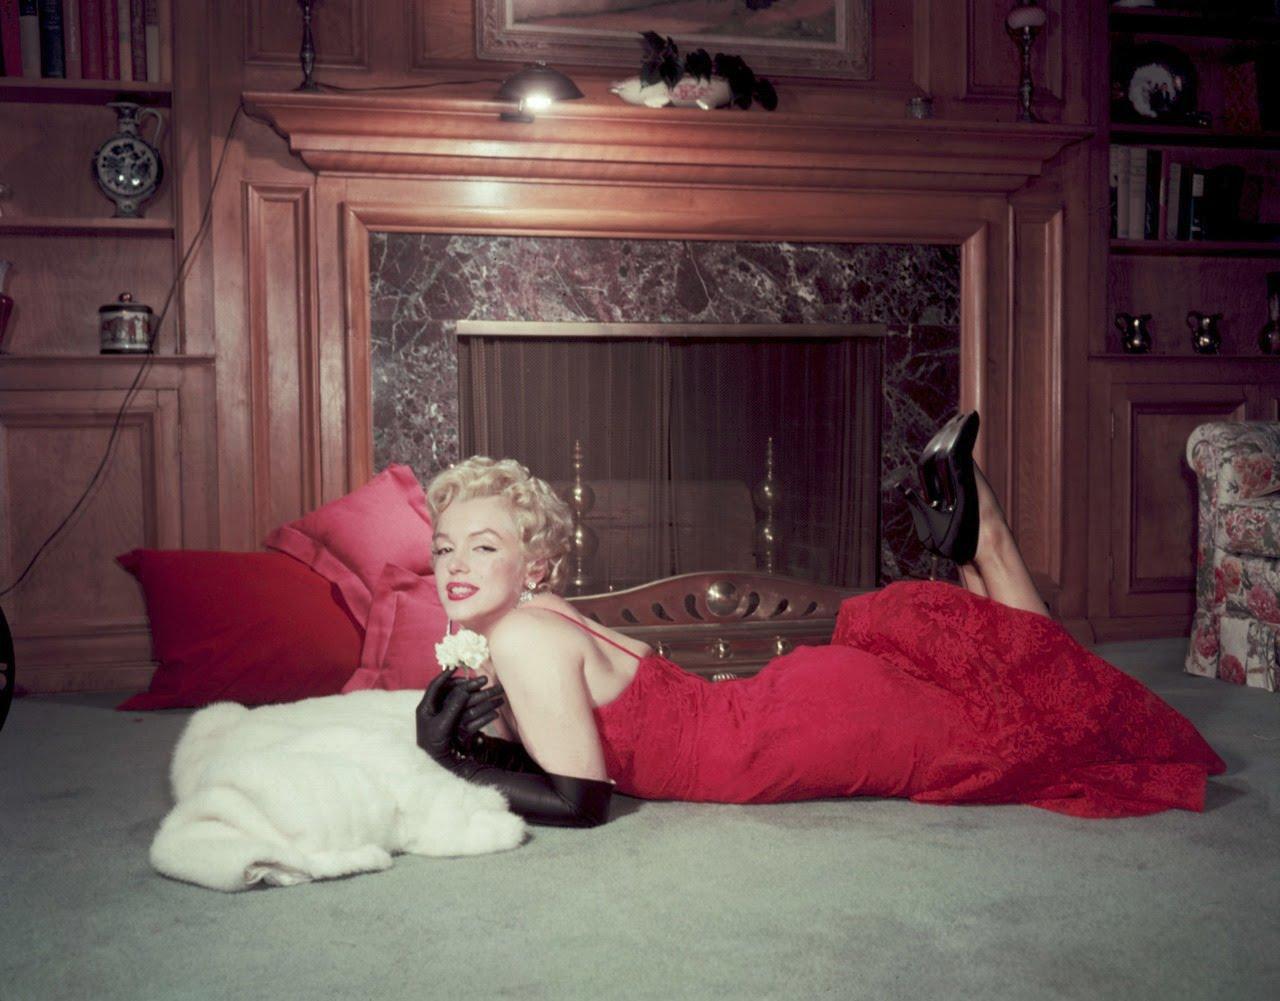 http://3.bp.blogspot.com/_a1QrXbQa9-I/TO6ssMQmtnI/AAAAAAAADZE/F-6jWbUP30s/s1600/Marilyn%2BMonroe.jpg